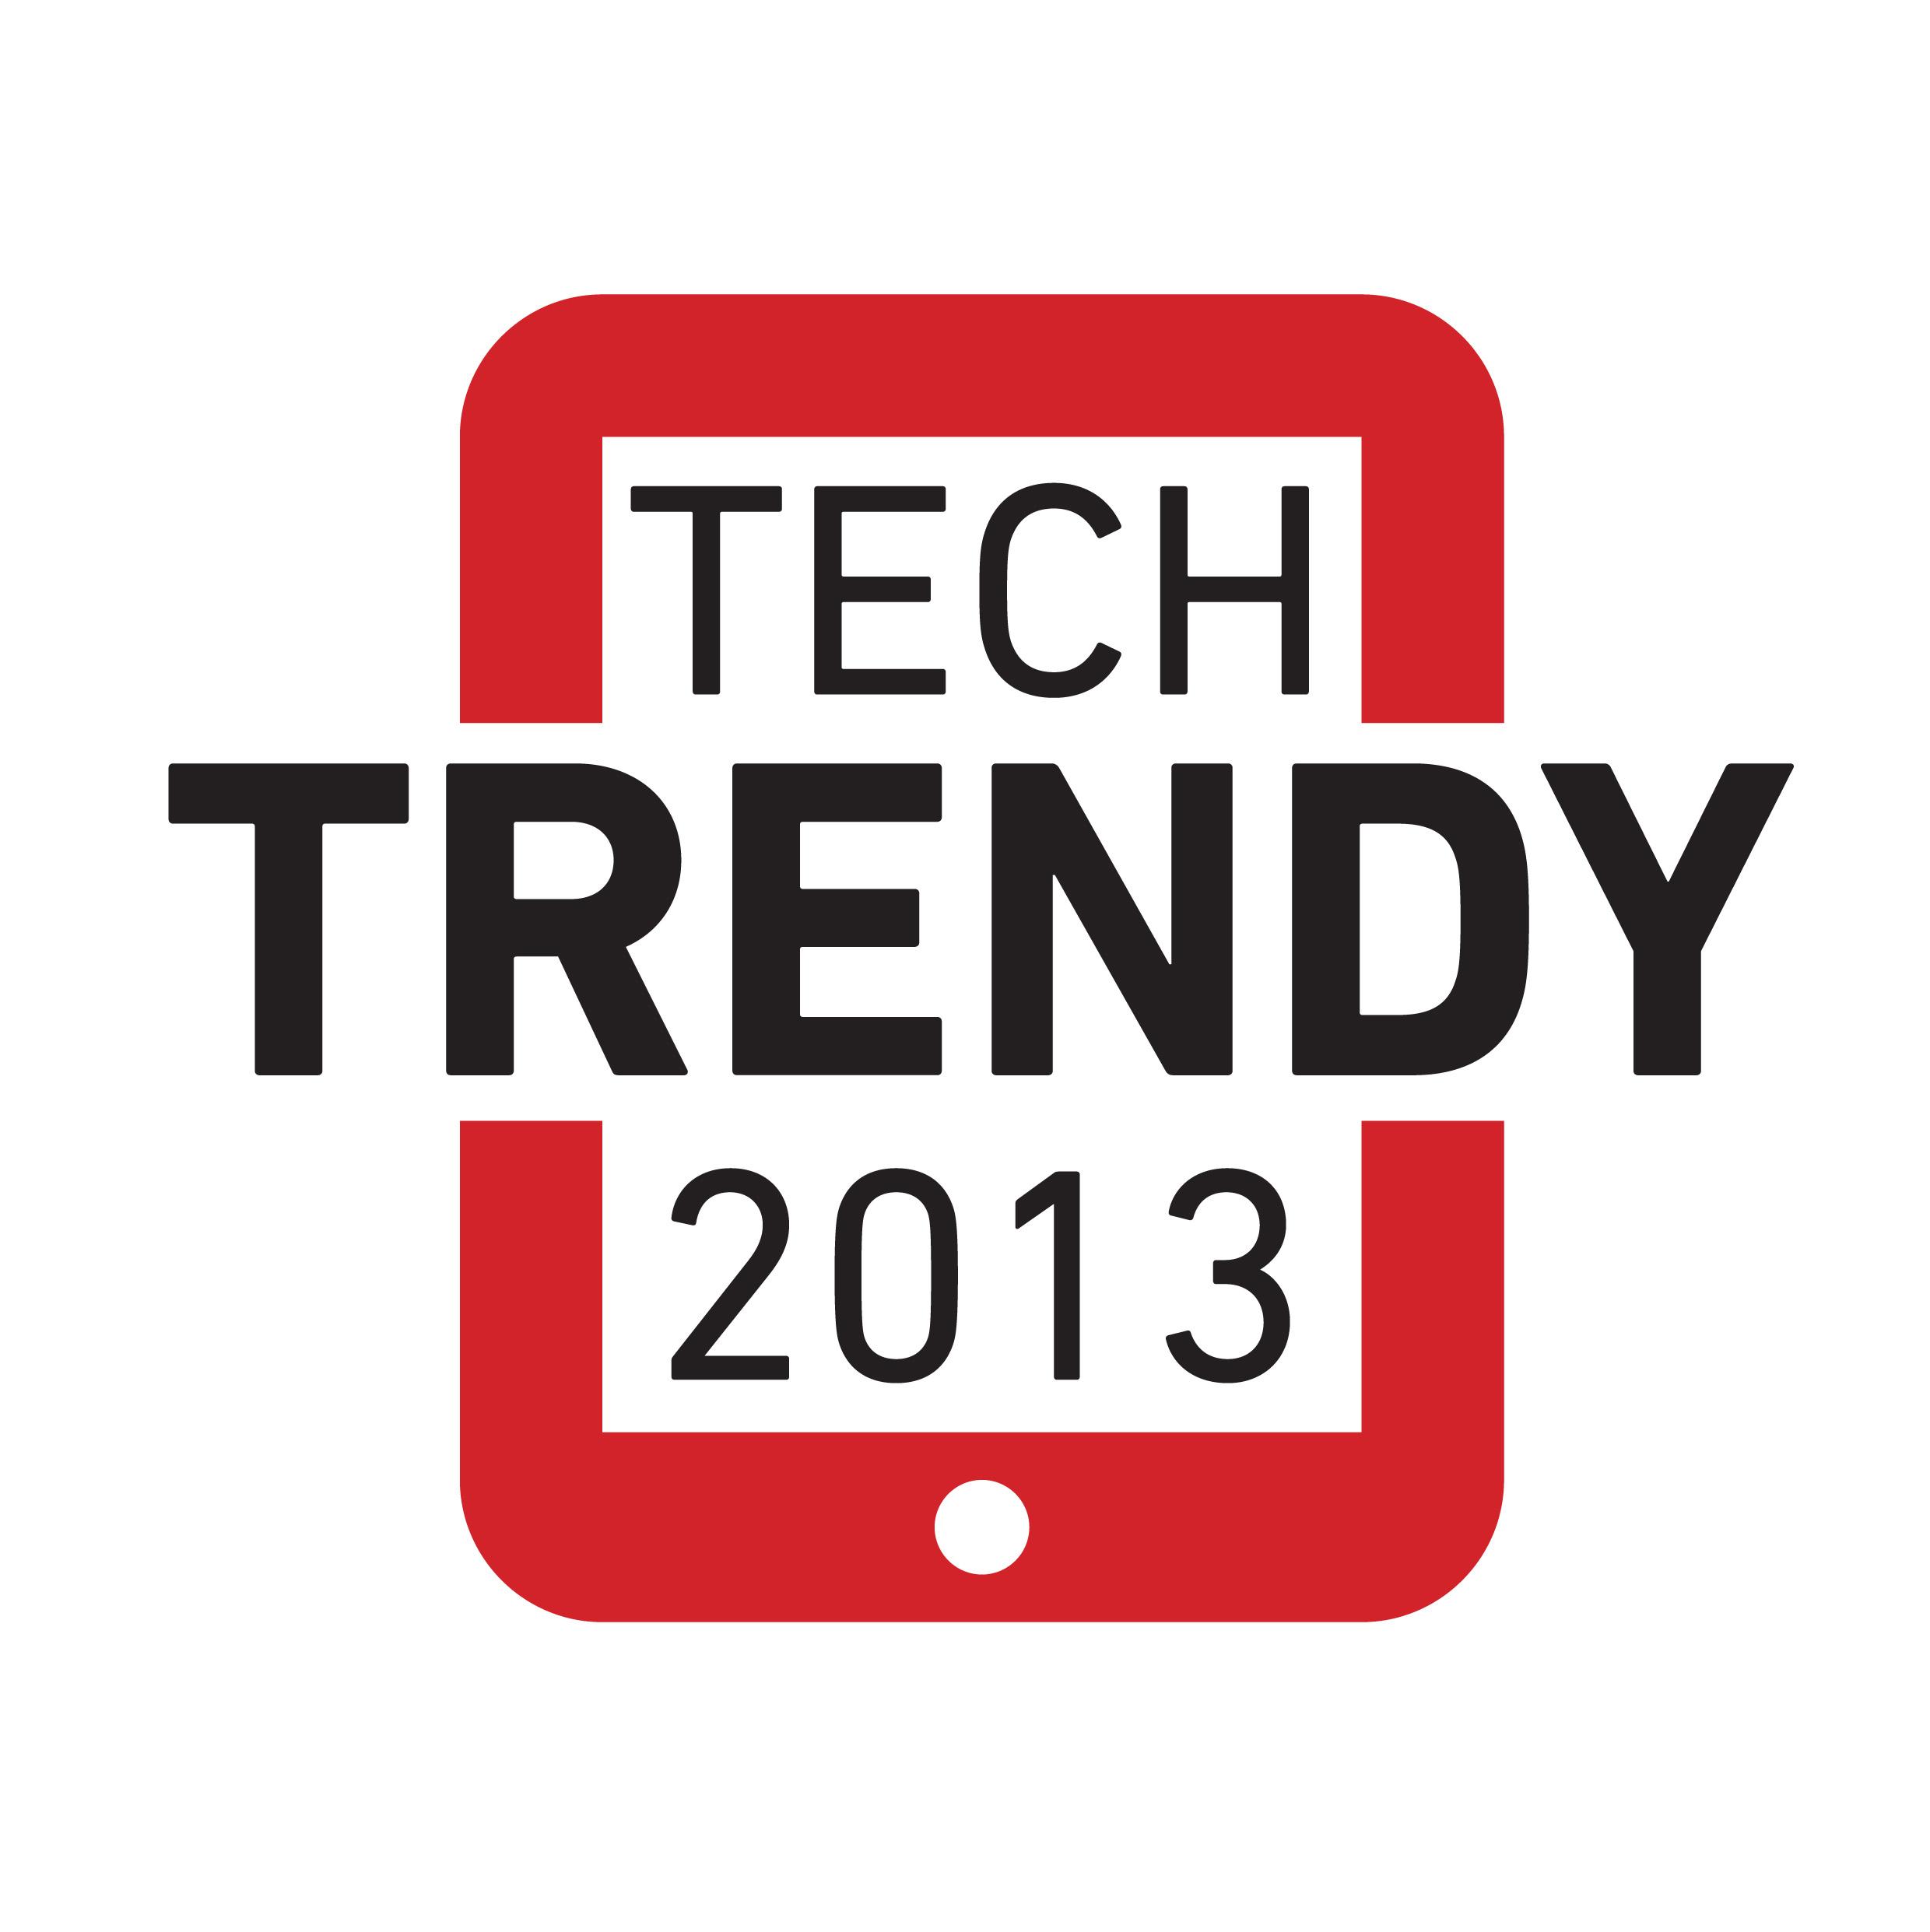 Tech.Trendy.2013: deszcz nagród!